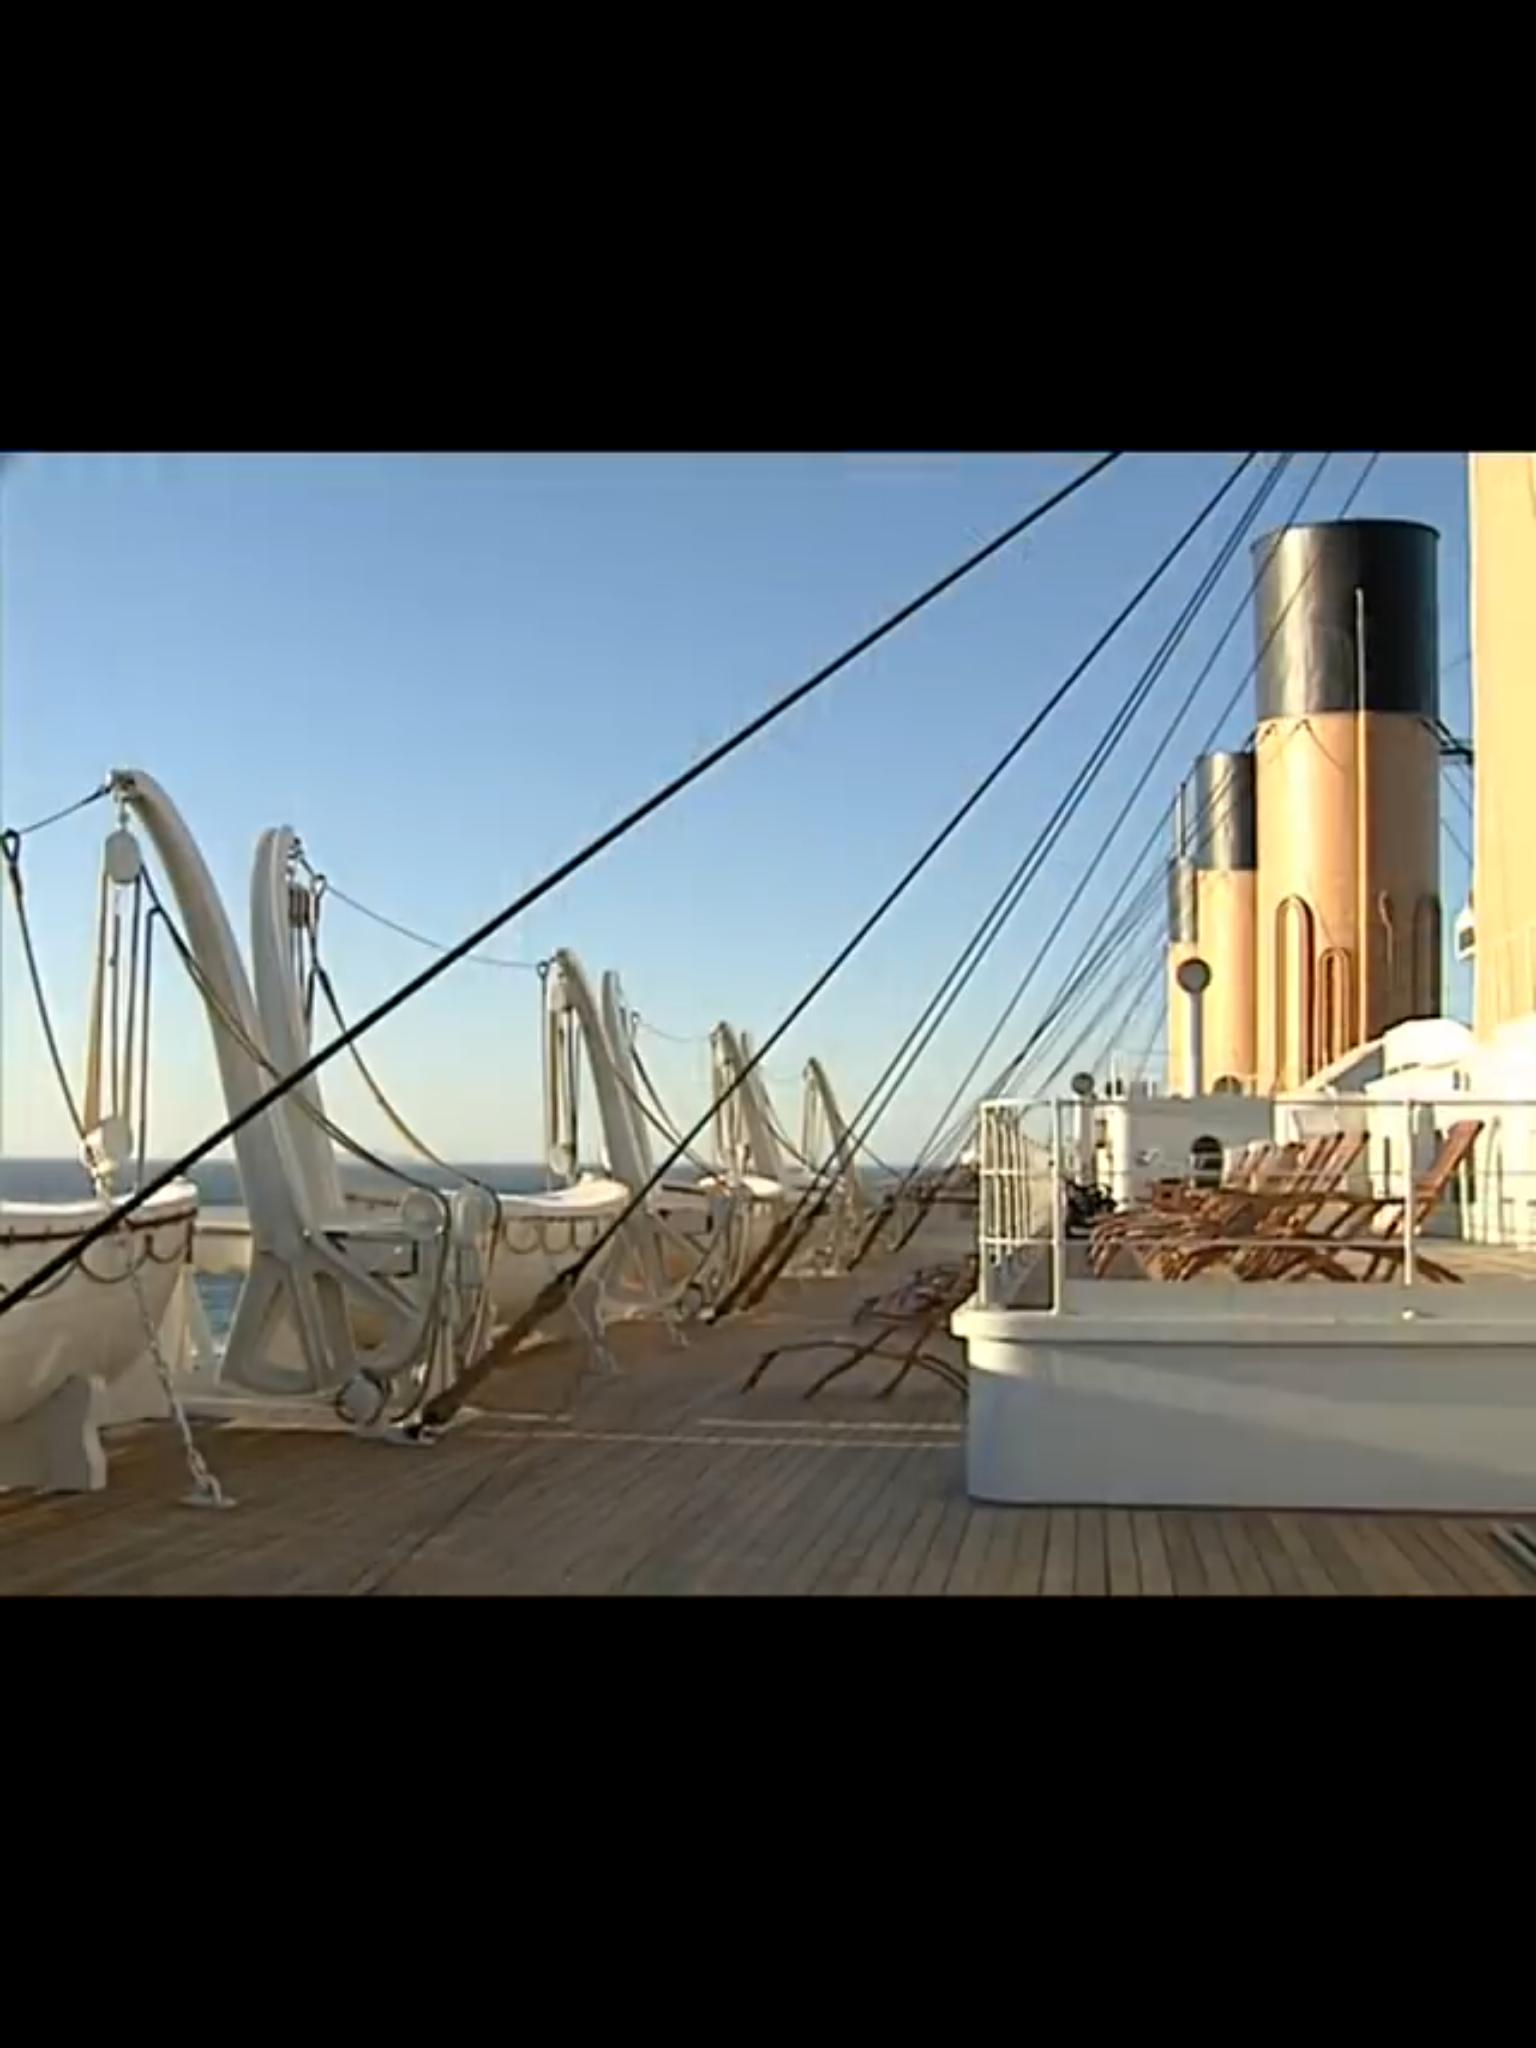 Titanic Engine Room Scene: Rms Titanic, Titanic Ship, Titanic Movie